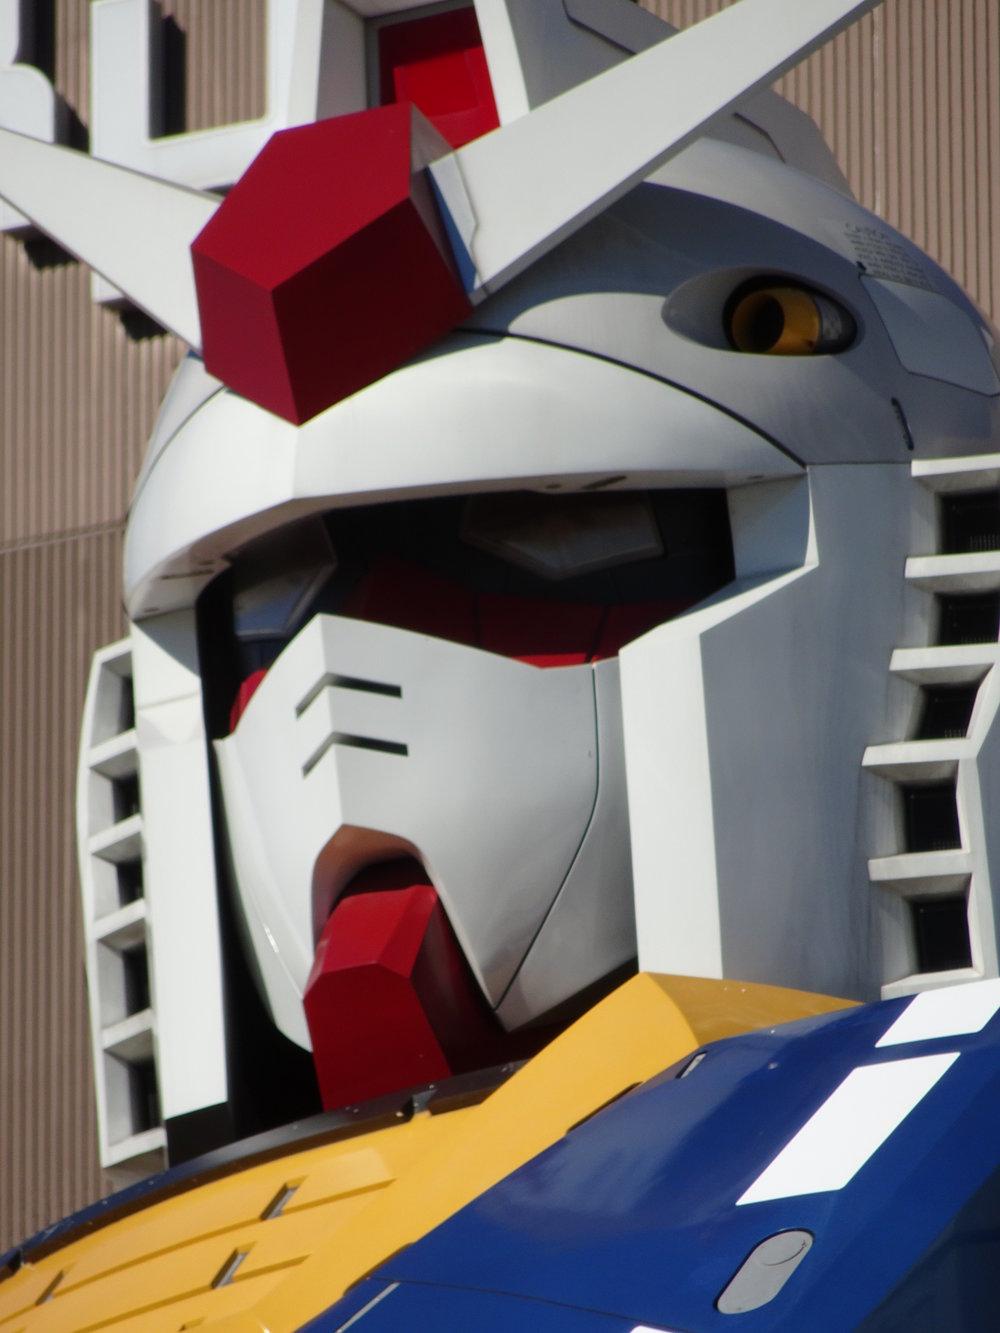 RX-78-2 Gundam 1-1 Statue - 004.jpg